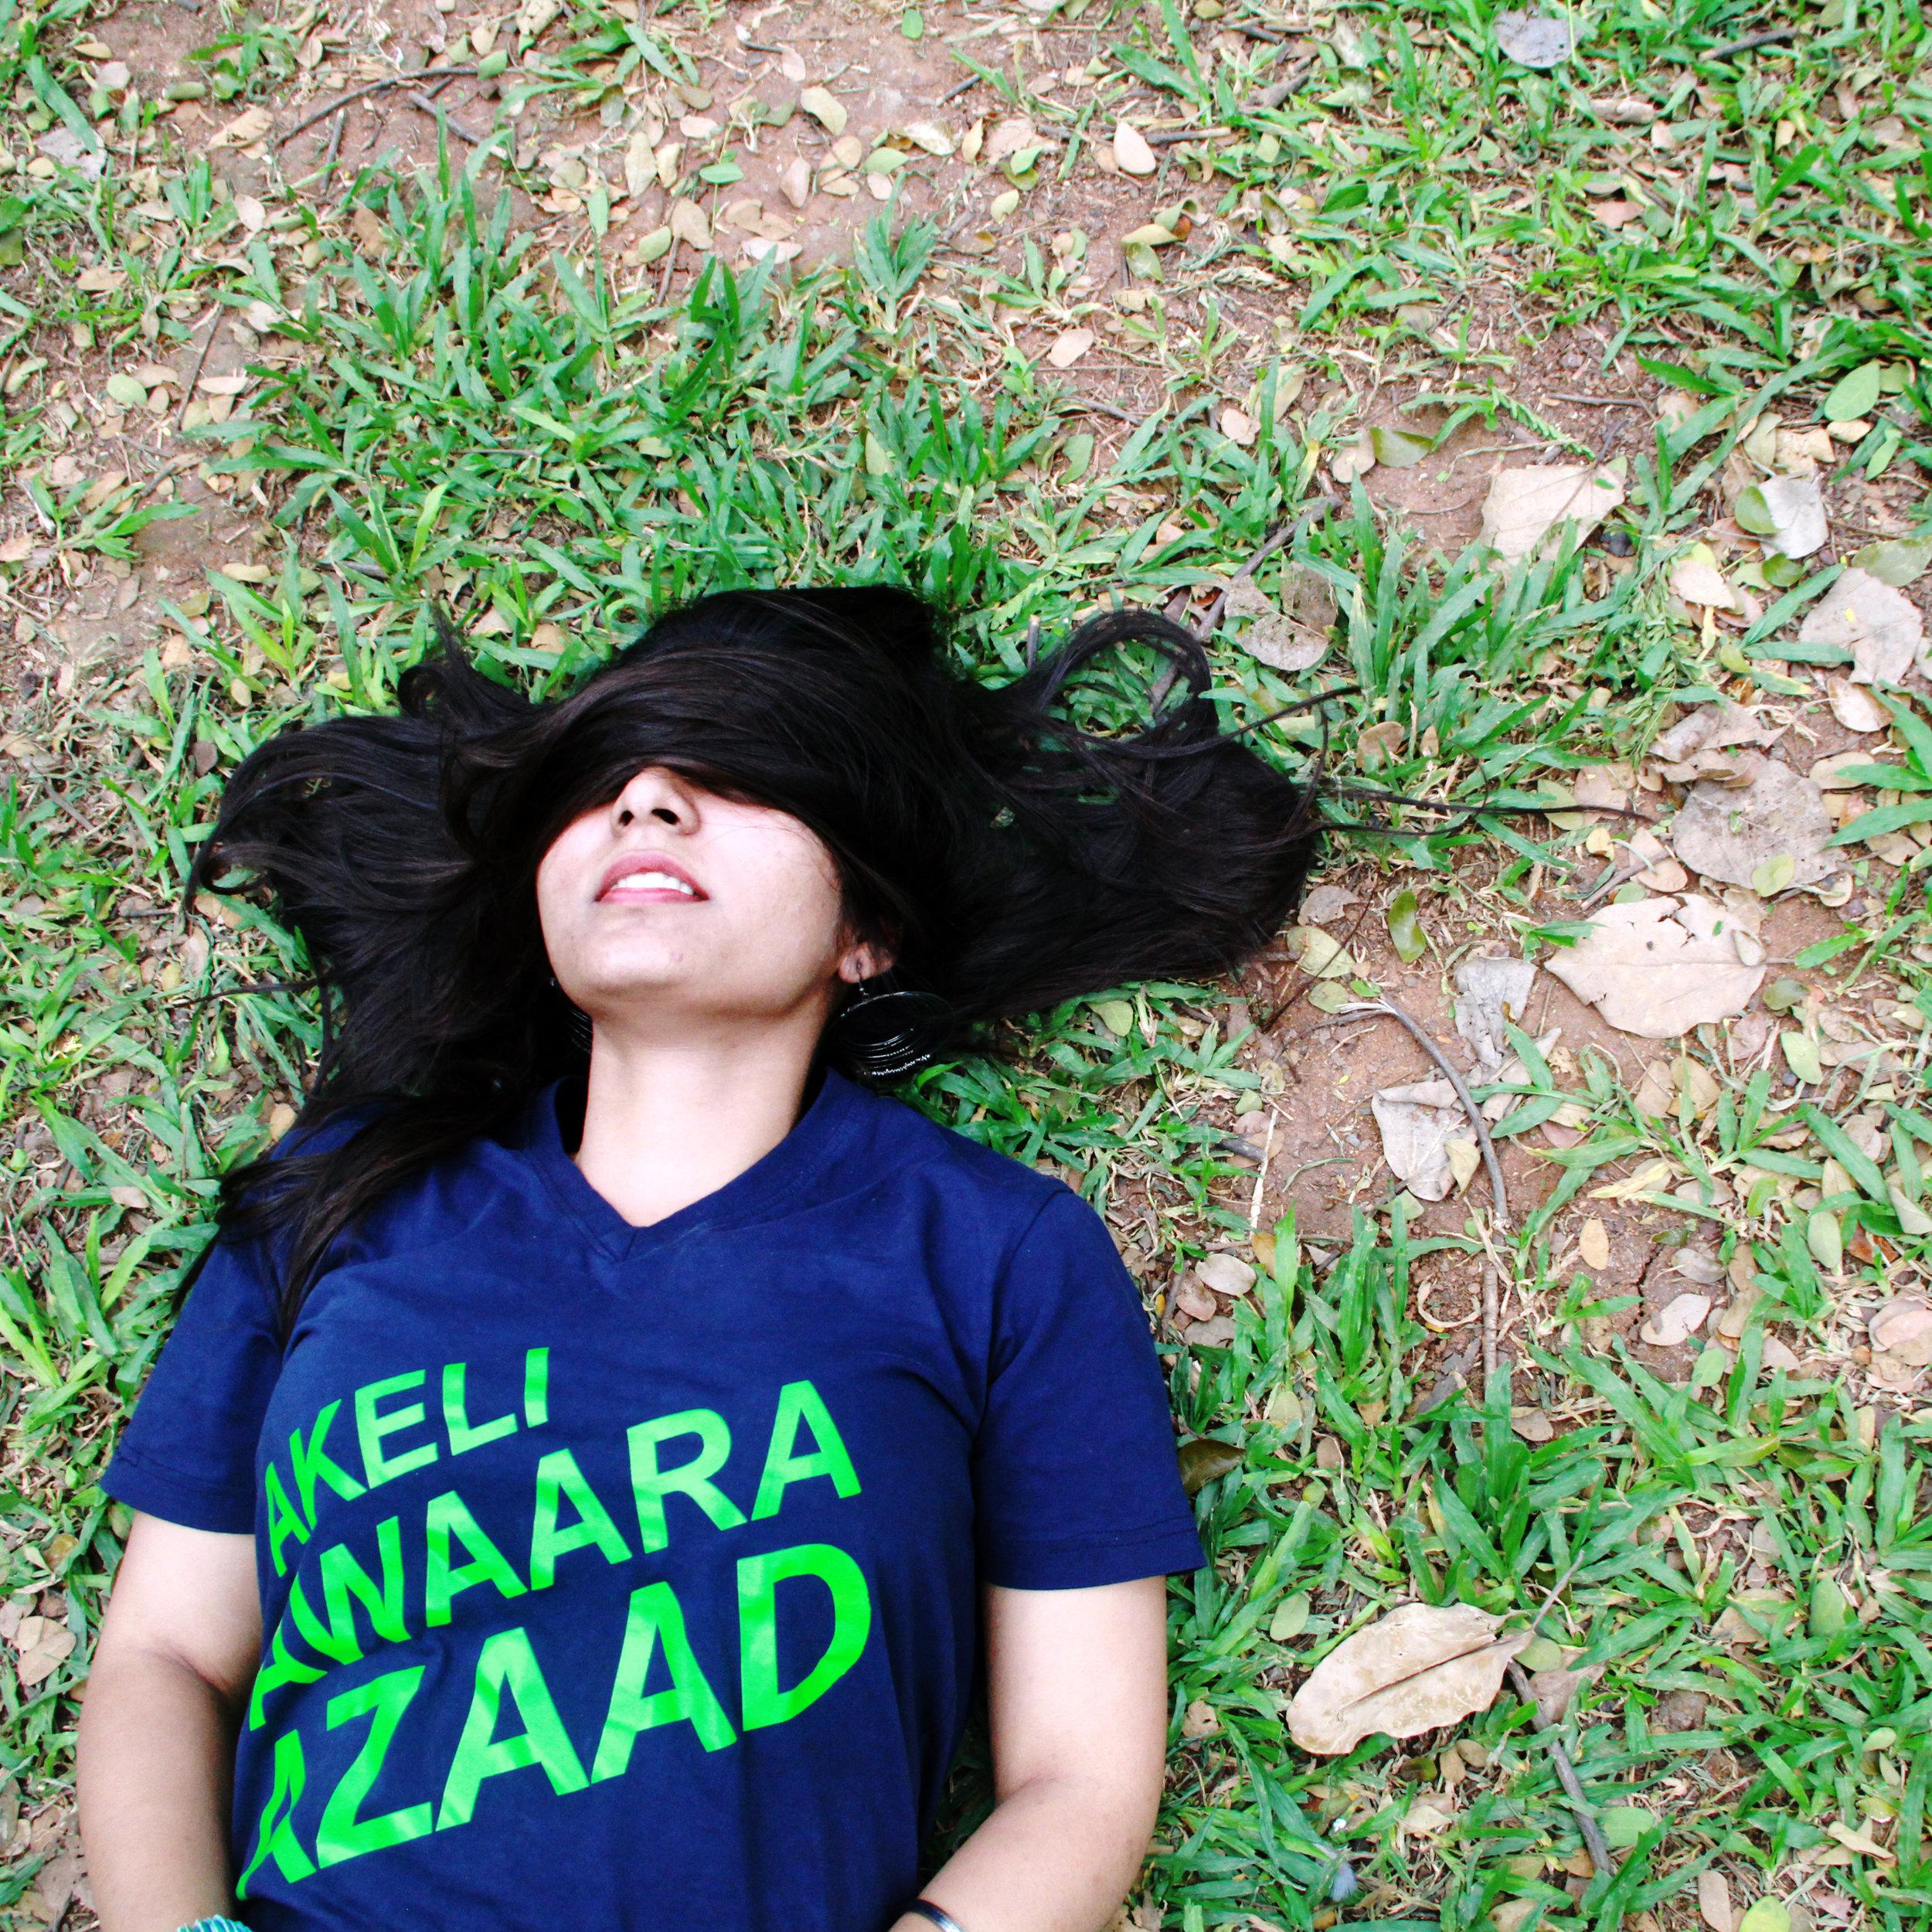 Juttu vippokoni gattiga navvey aada daani, yennadu nammoddhu!(Telegu)Never trust a woman who laughs loudly with her hair open. -